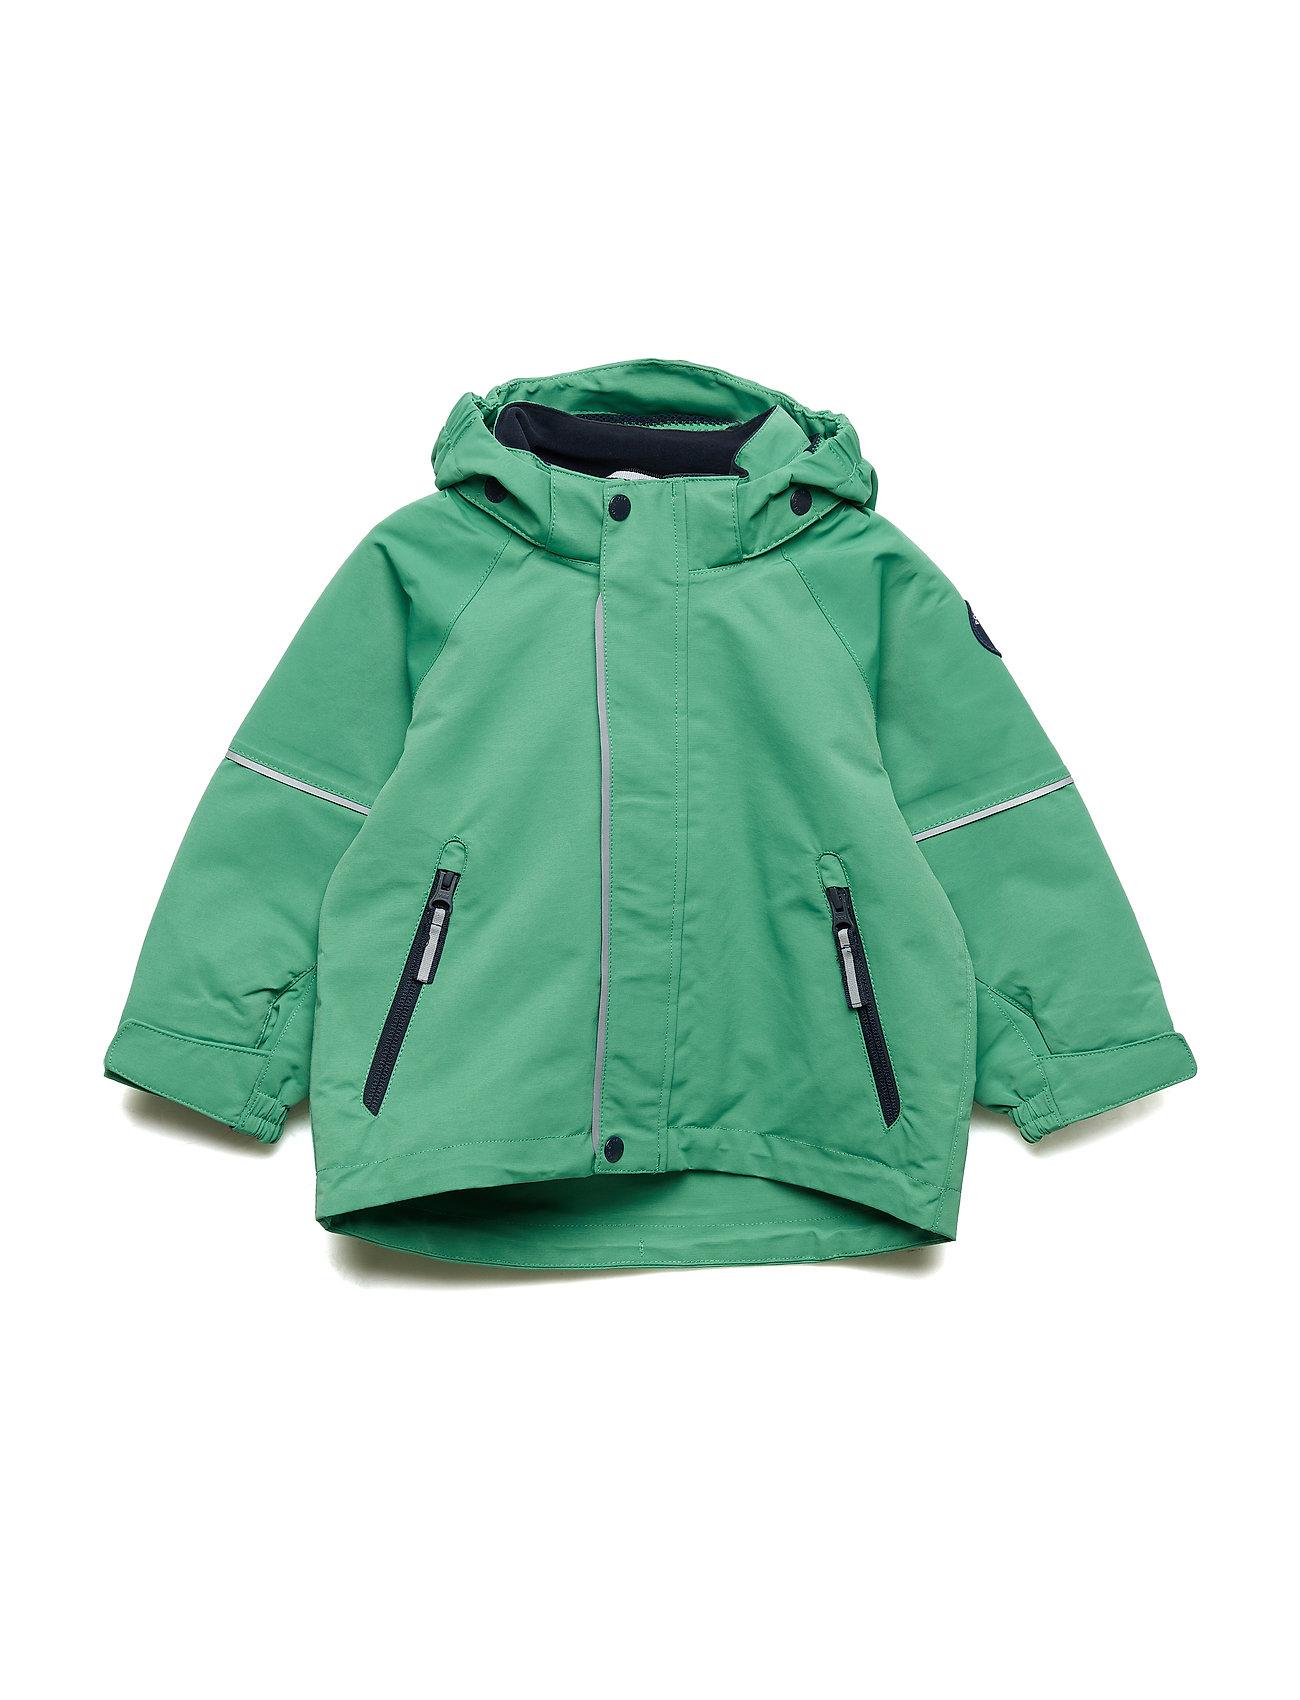 Polarn O. Pyret Jacket Shell Solid Preschool - LEPRECHAUN